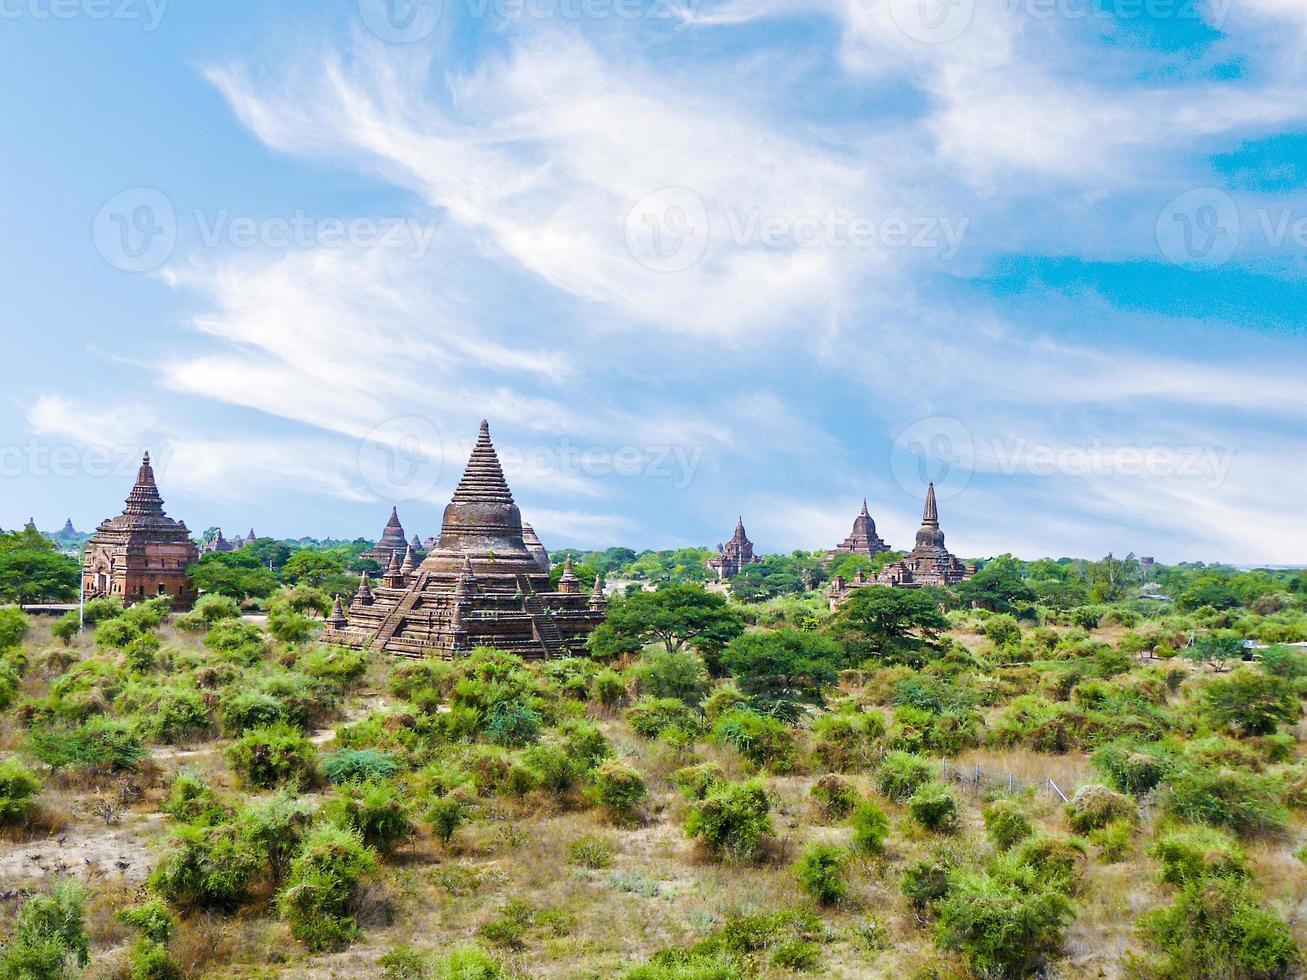 pagoda en bagan (pagano), mandalay, myanmar foto